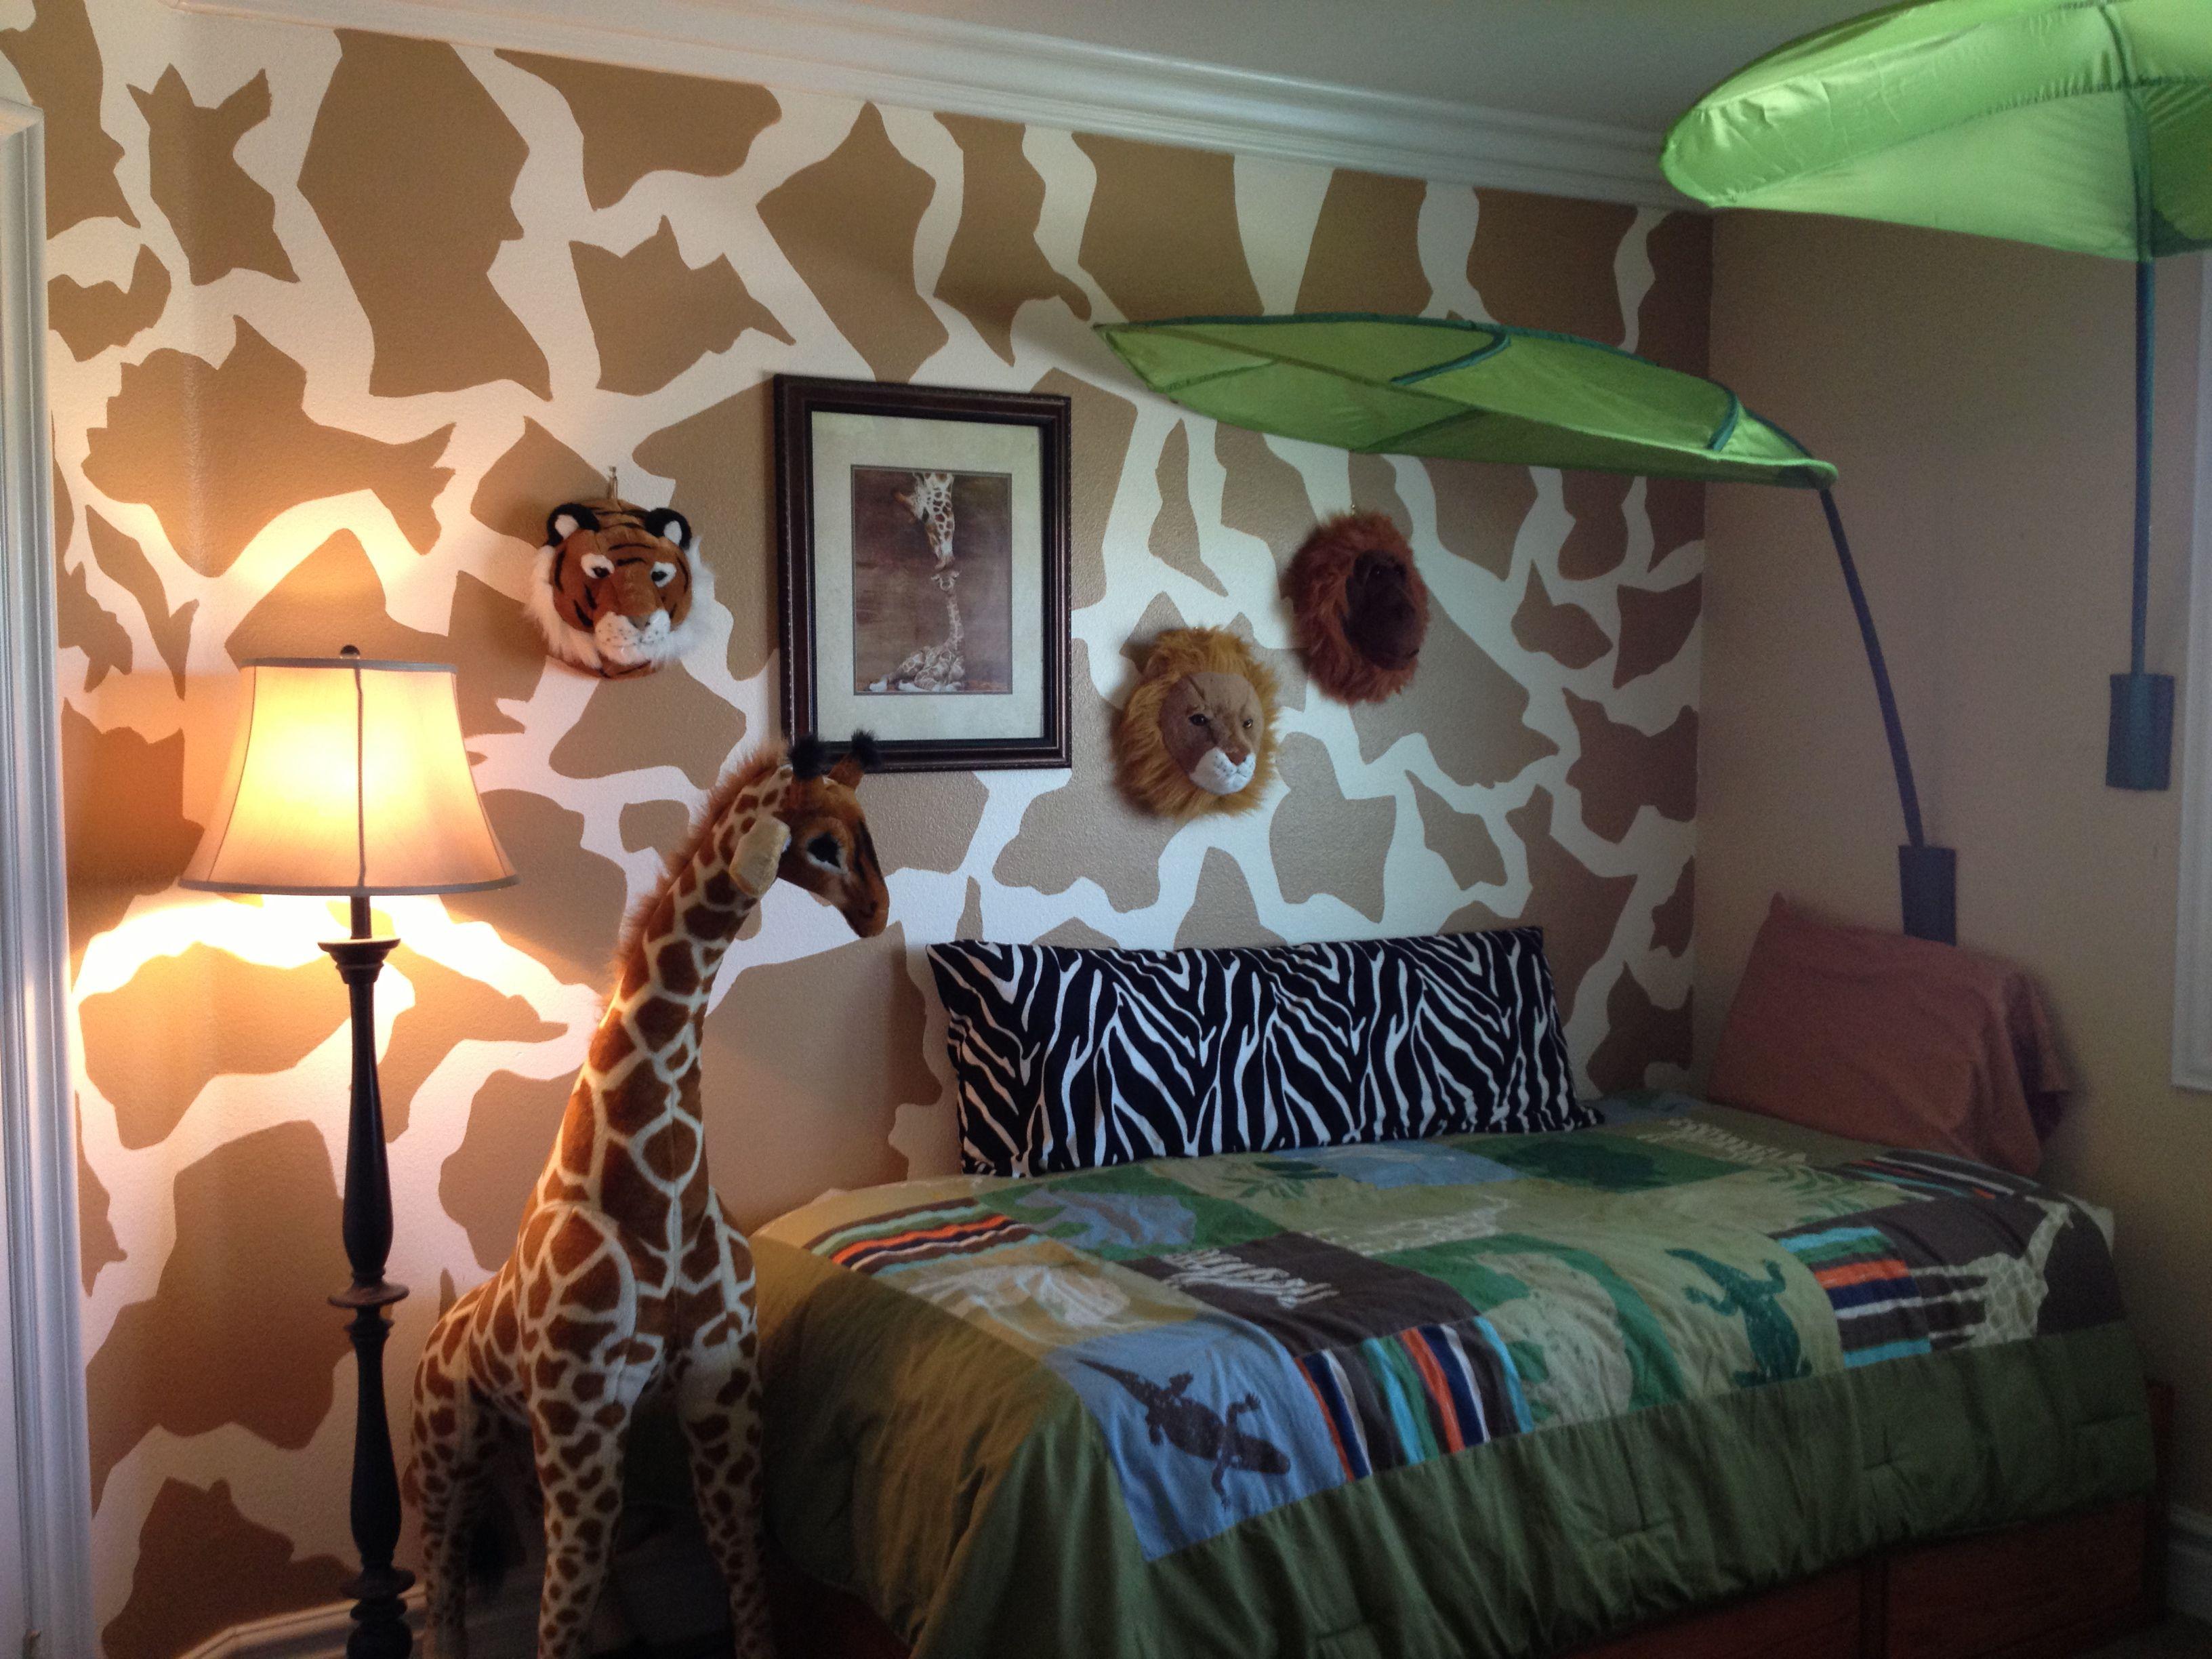 Kids Love Themed Bedroom Sets: Kids Jungle Room-ikea Leaf 14.99